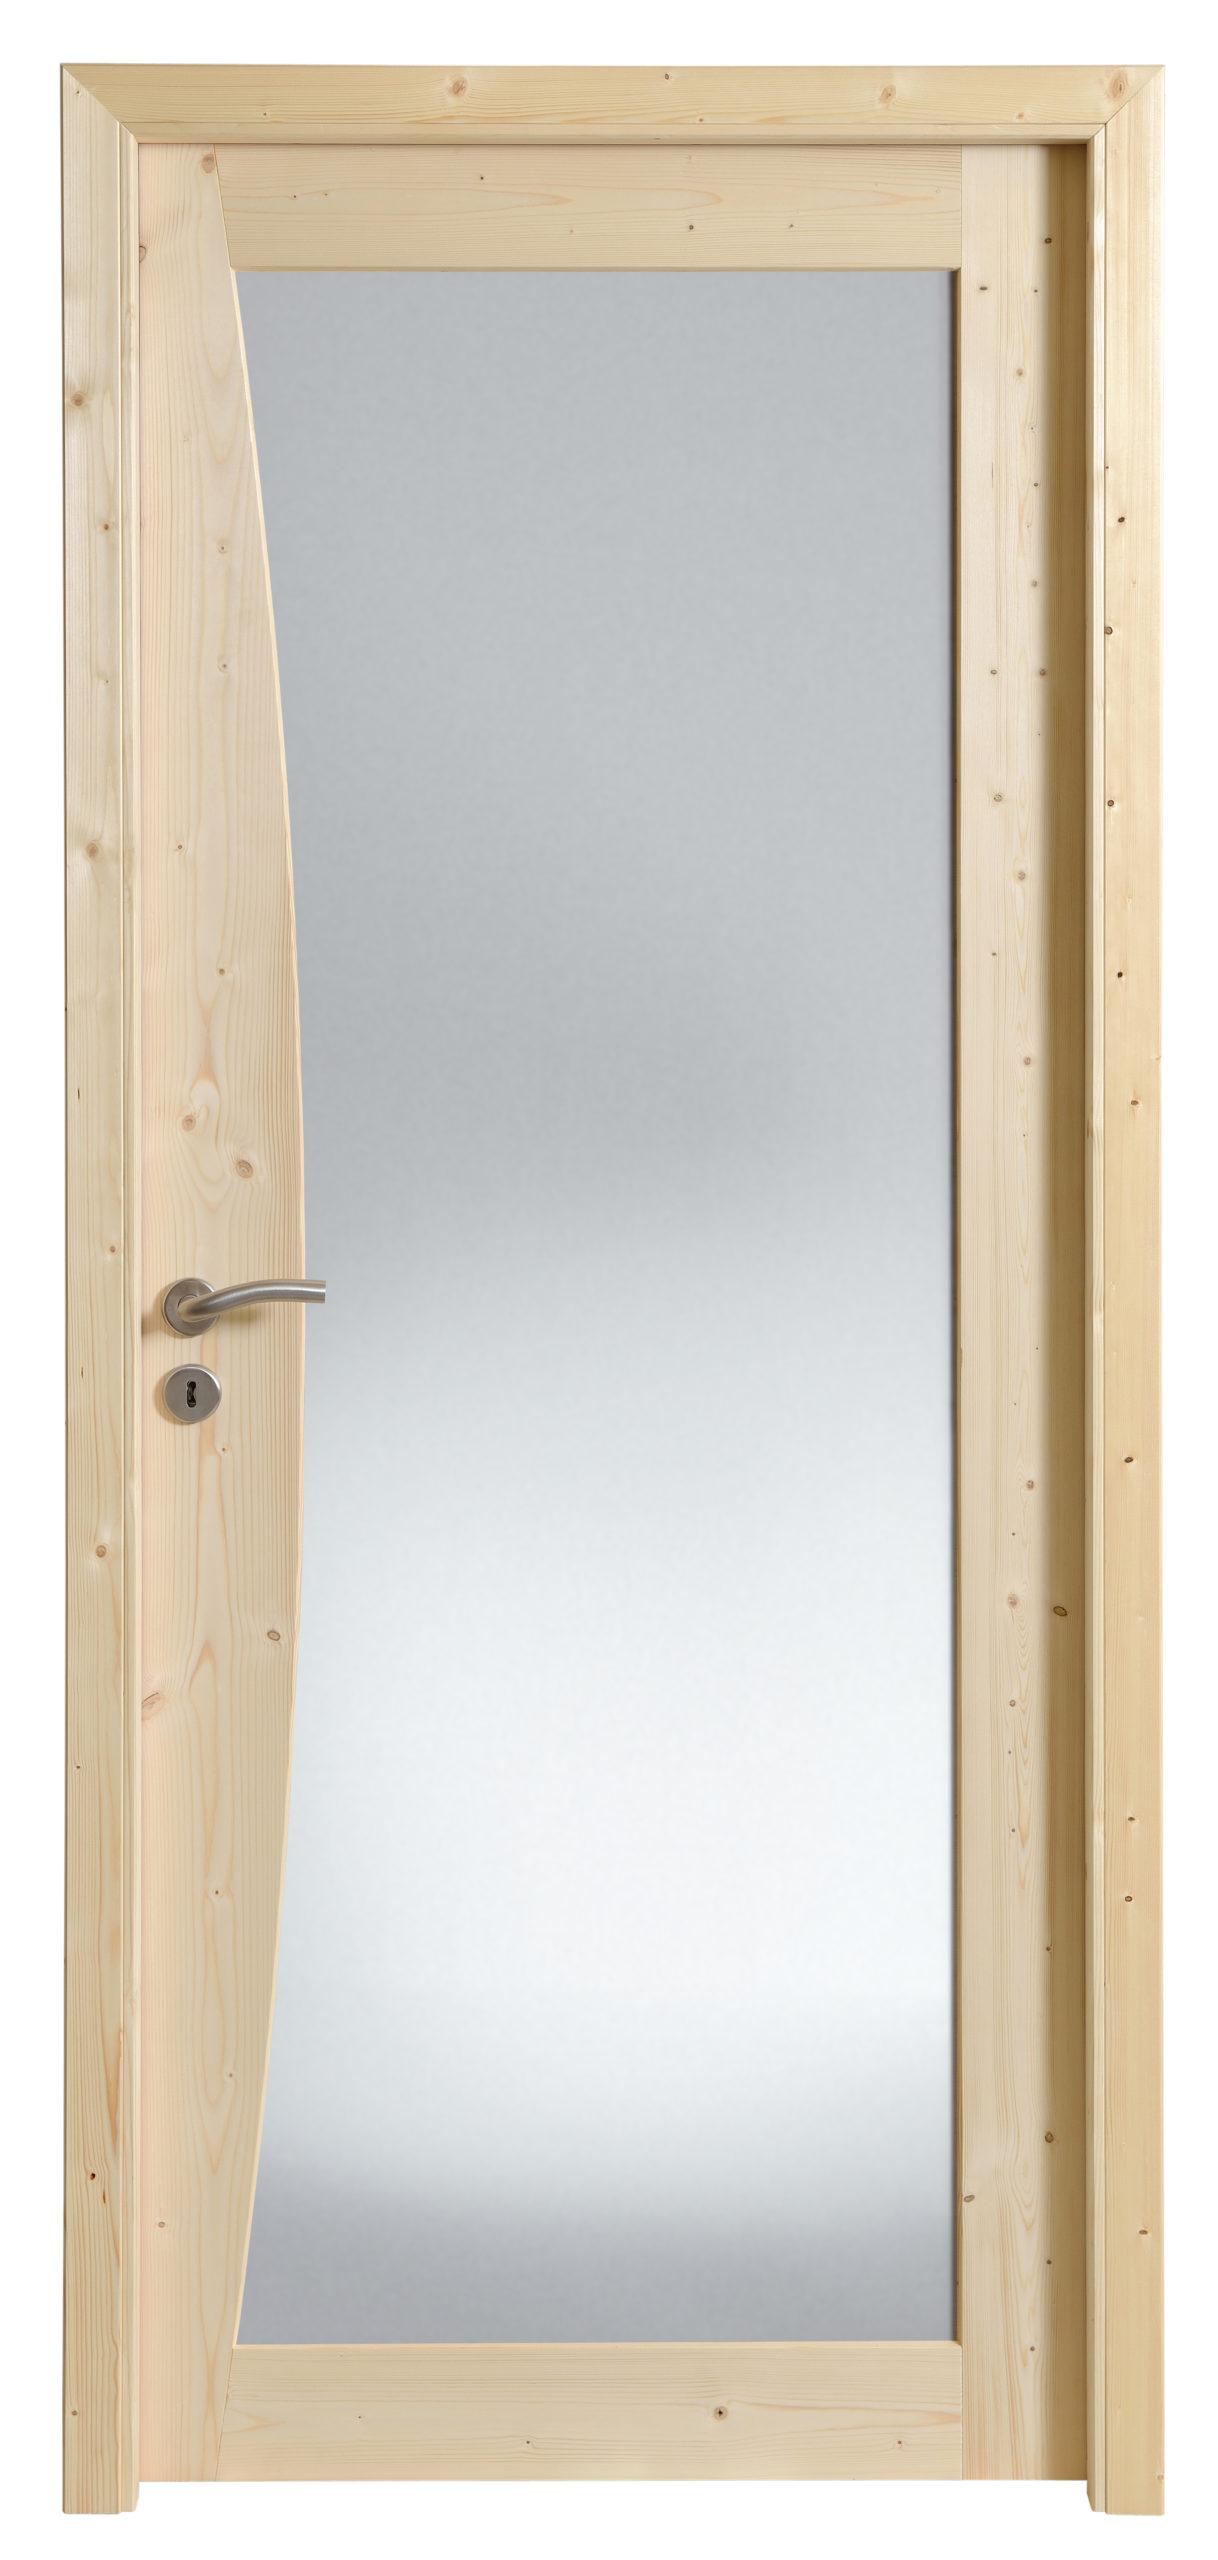 Porte intérieure Tramontane Scandesign